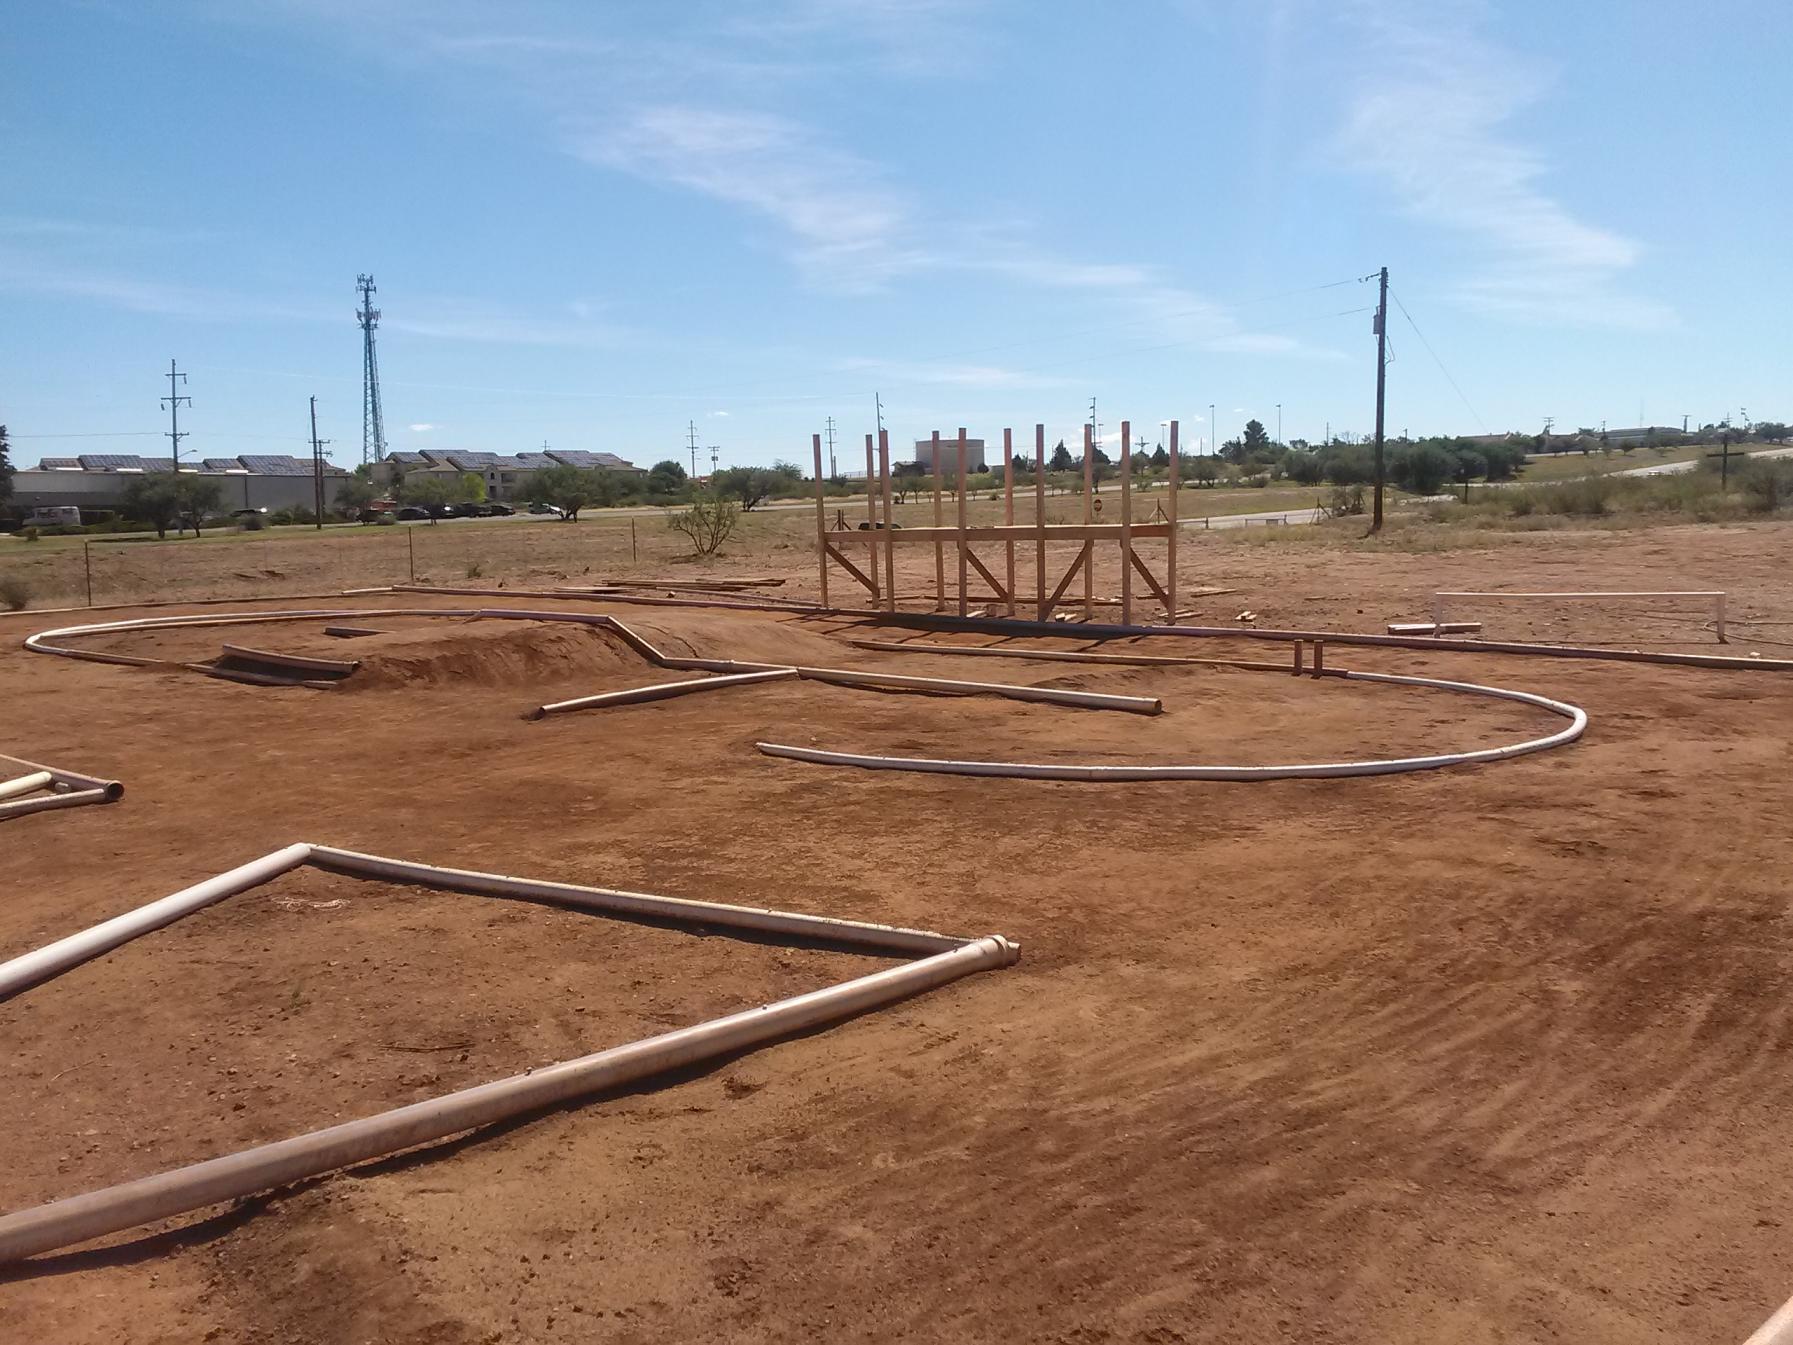 New Dirt Track Se Az Near Sierra Vista Ft Huachuca R C